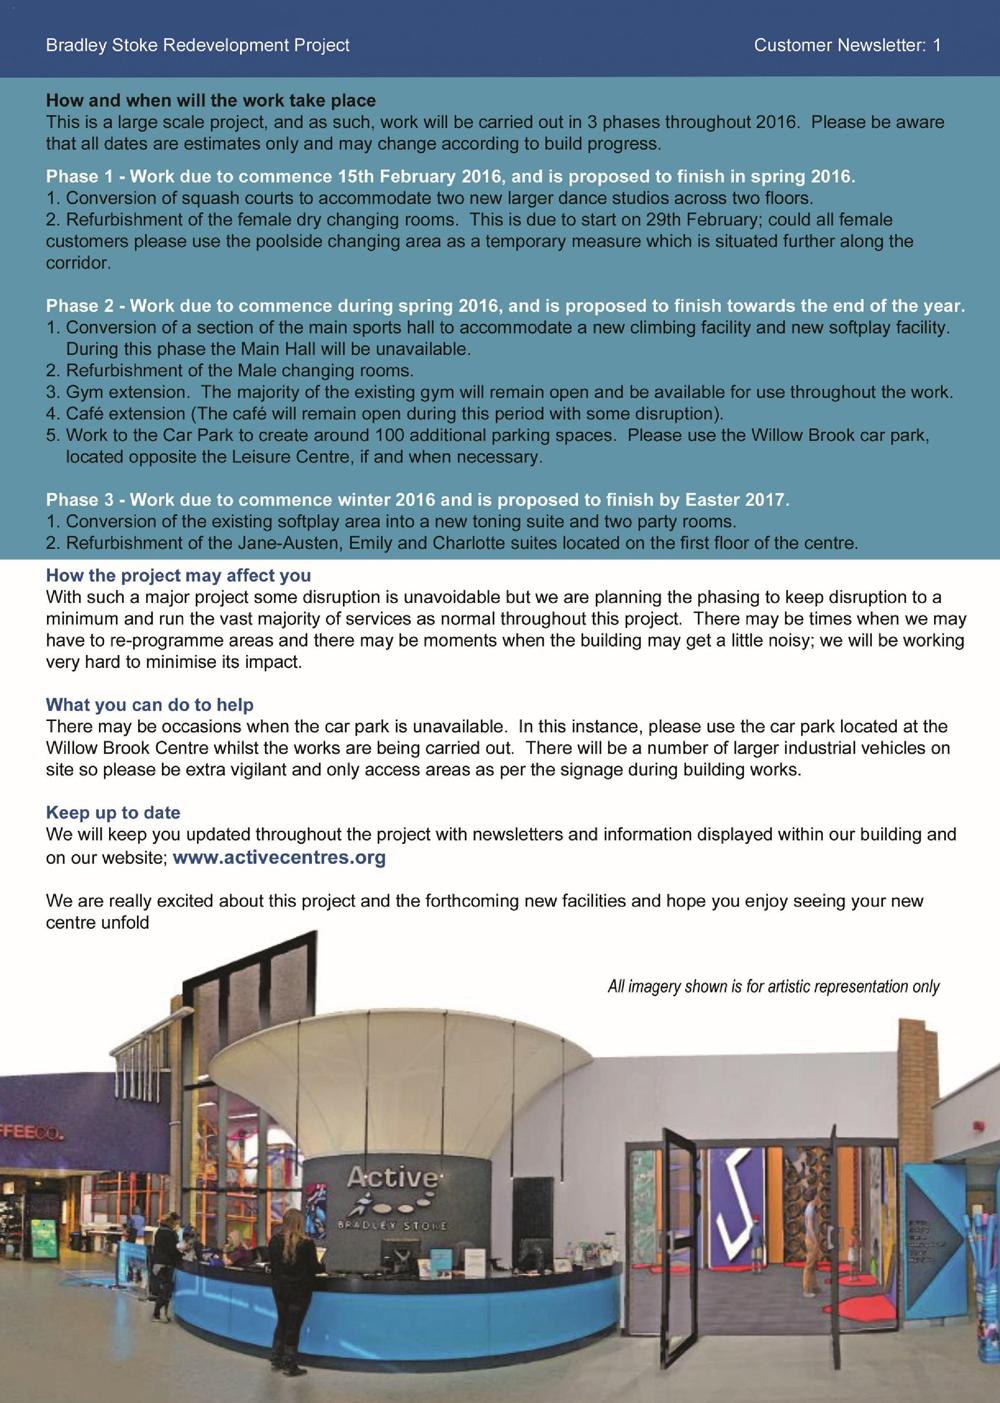 Bradley-Stoke-Redevelopment-Project-Customer-Newsletter1-2